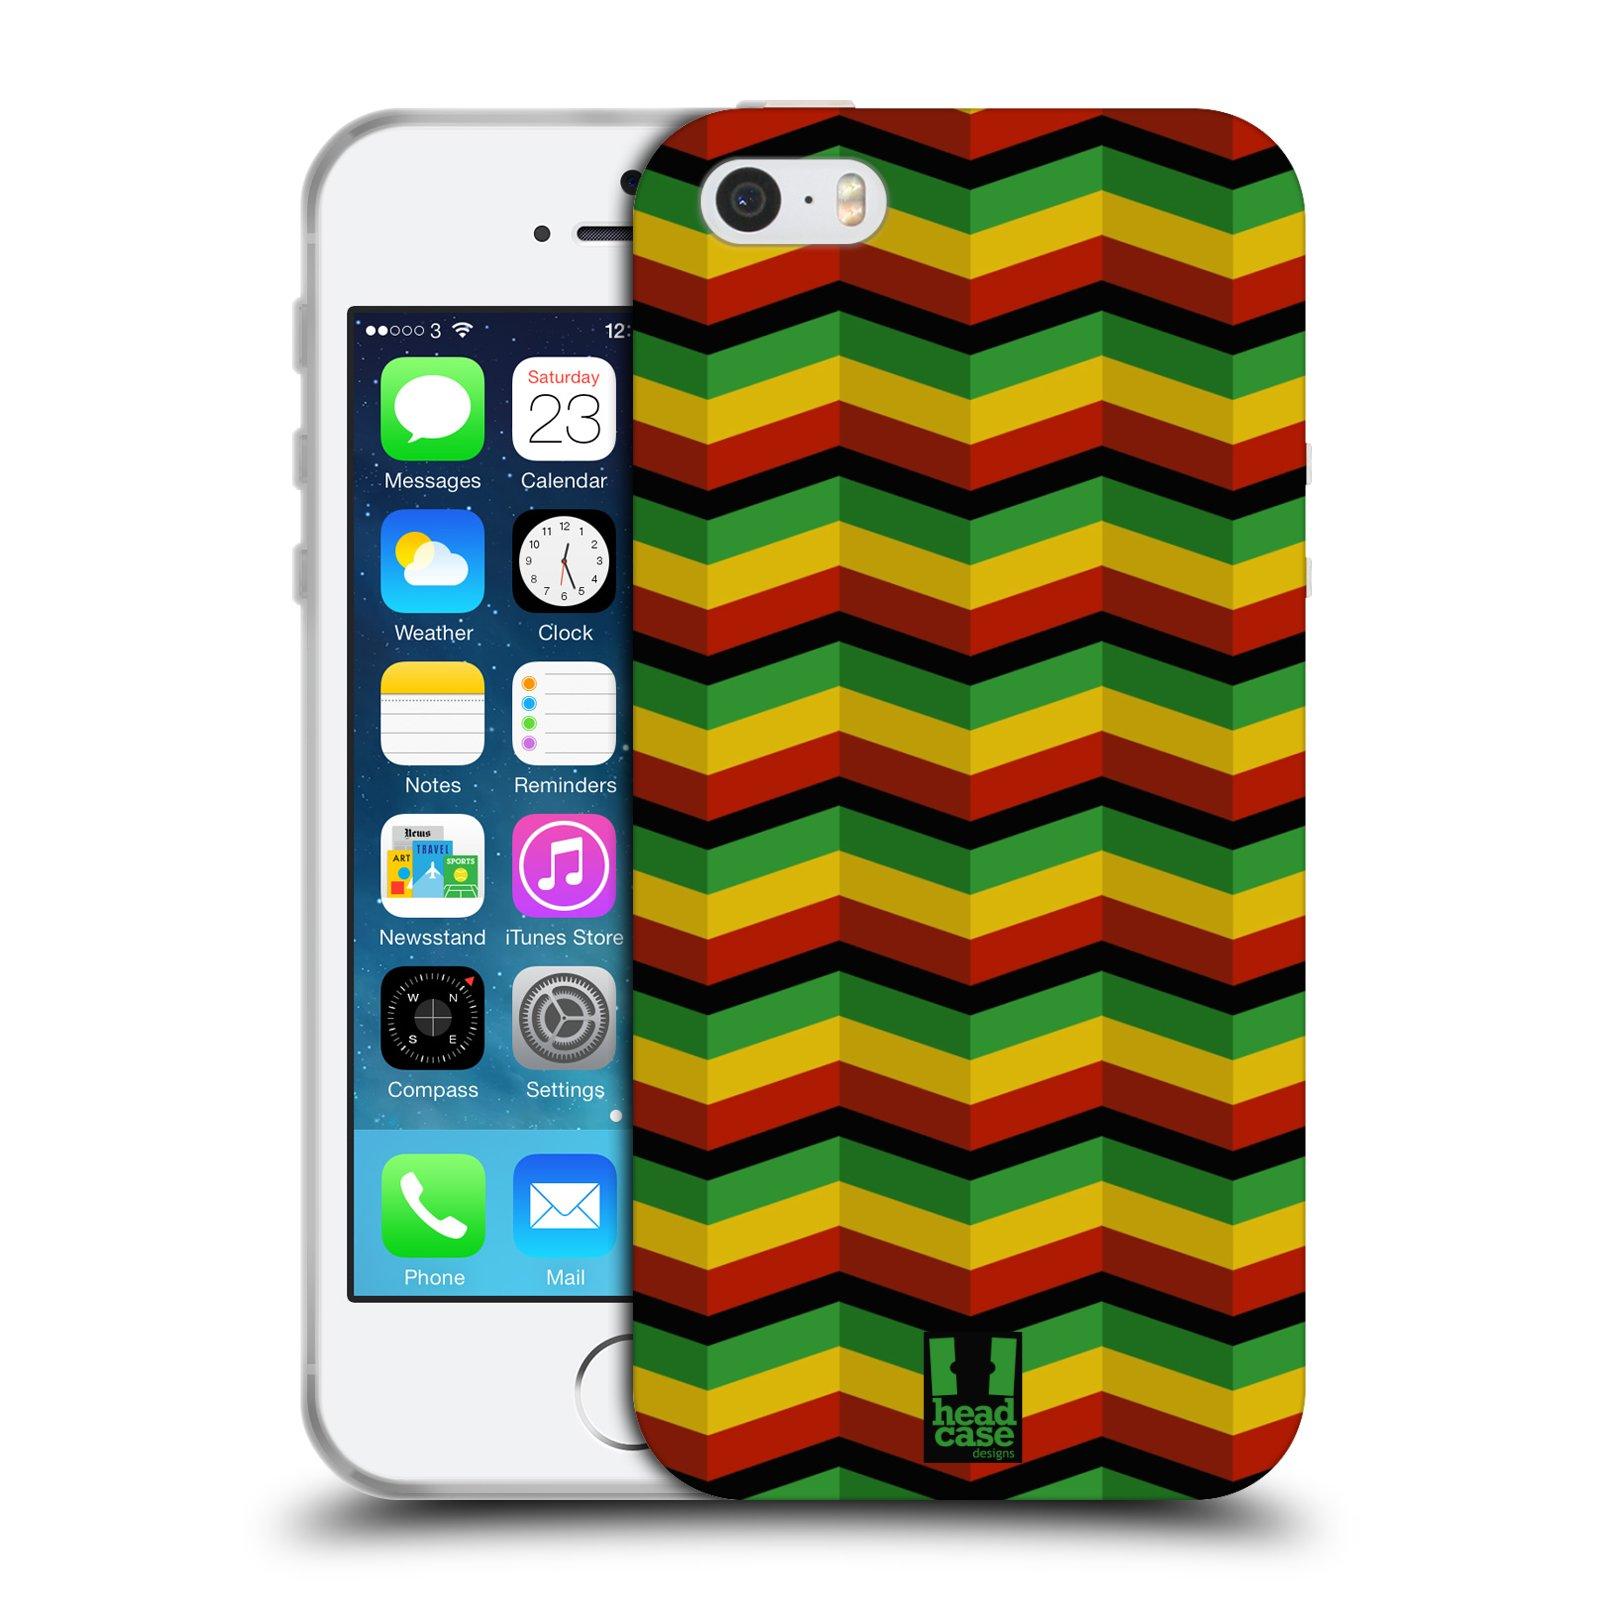 HEAD CASE silikonový obal na mobil Apple Iphone 5/5S vzor Rasta barevné vzory CHEVRON